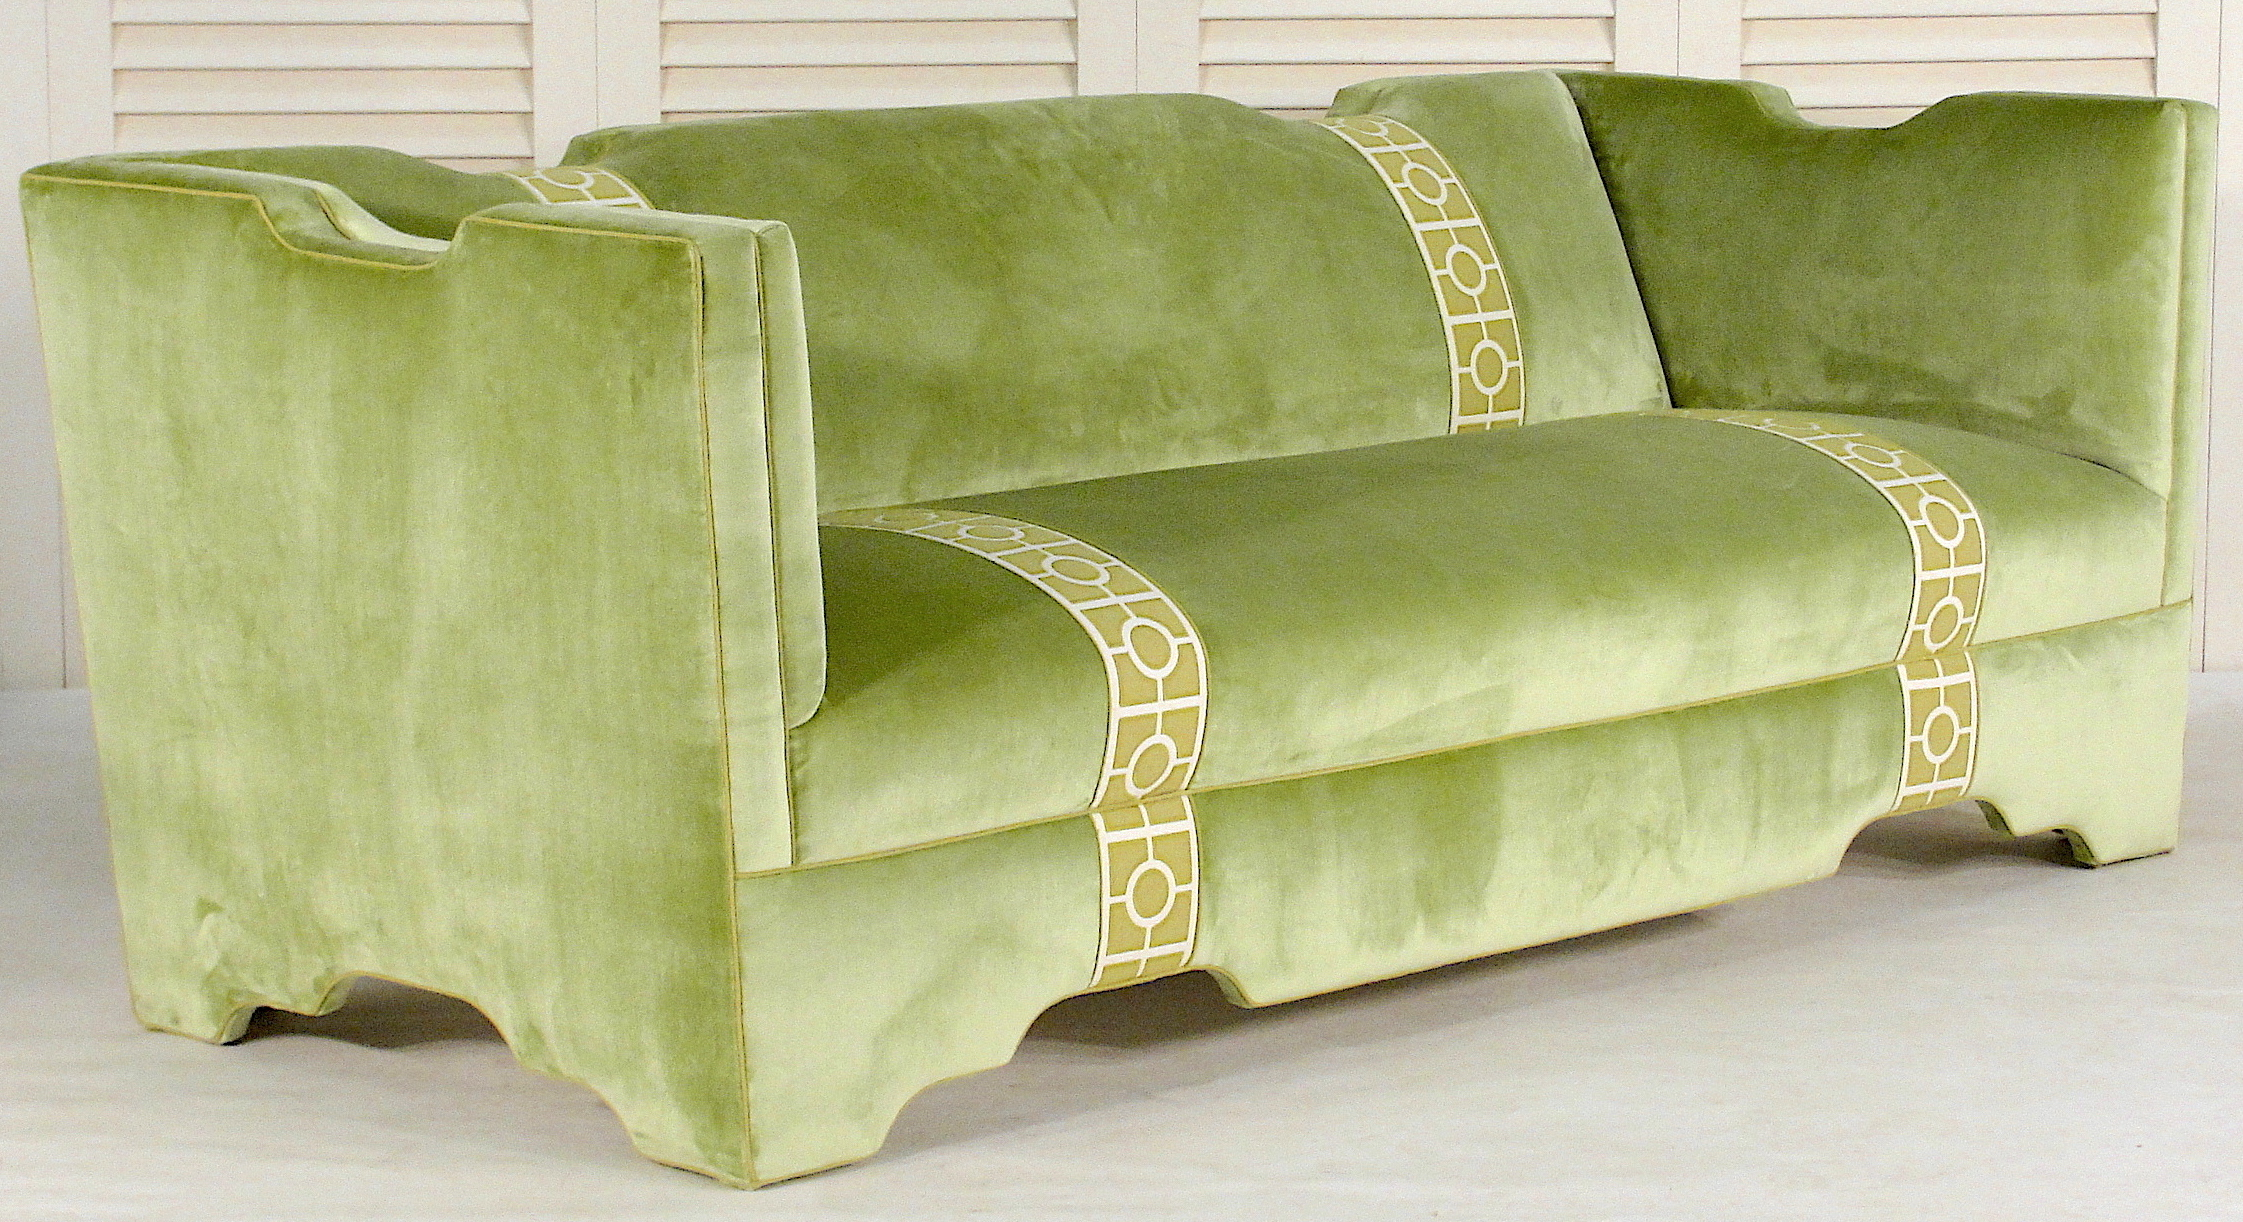   Sf 153 Custom Sofa With Regard To Customized Sofas (View 10 of 15)